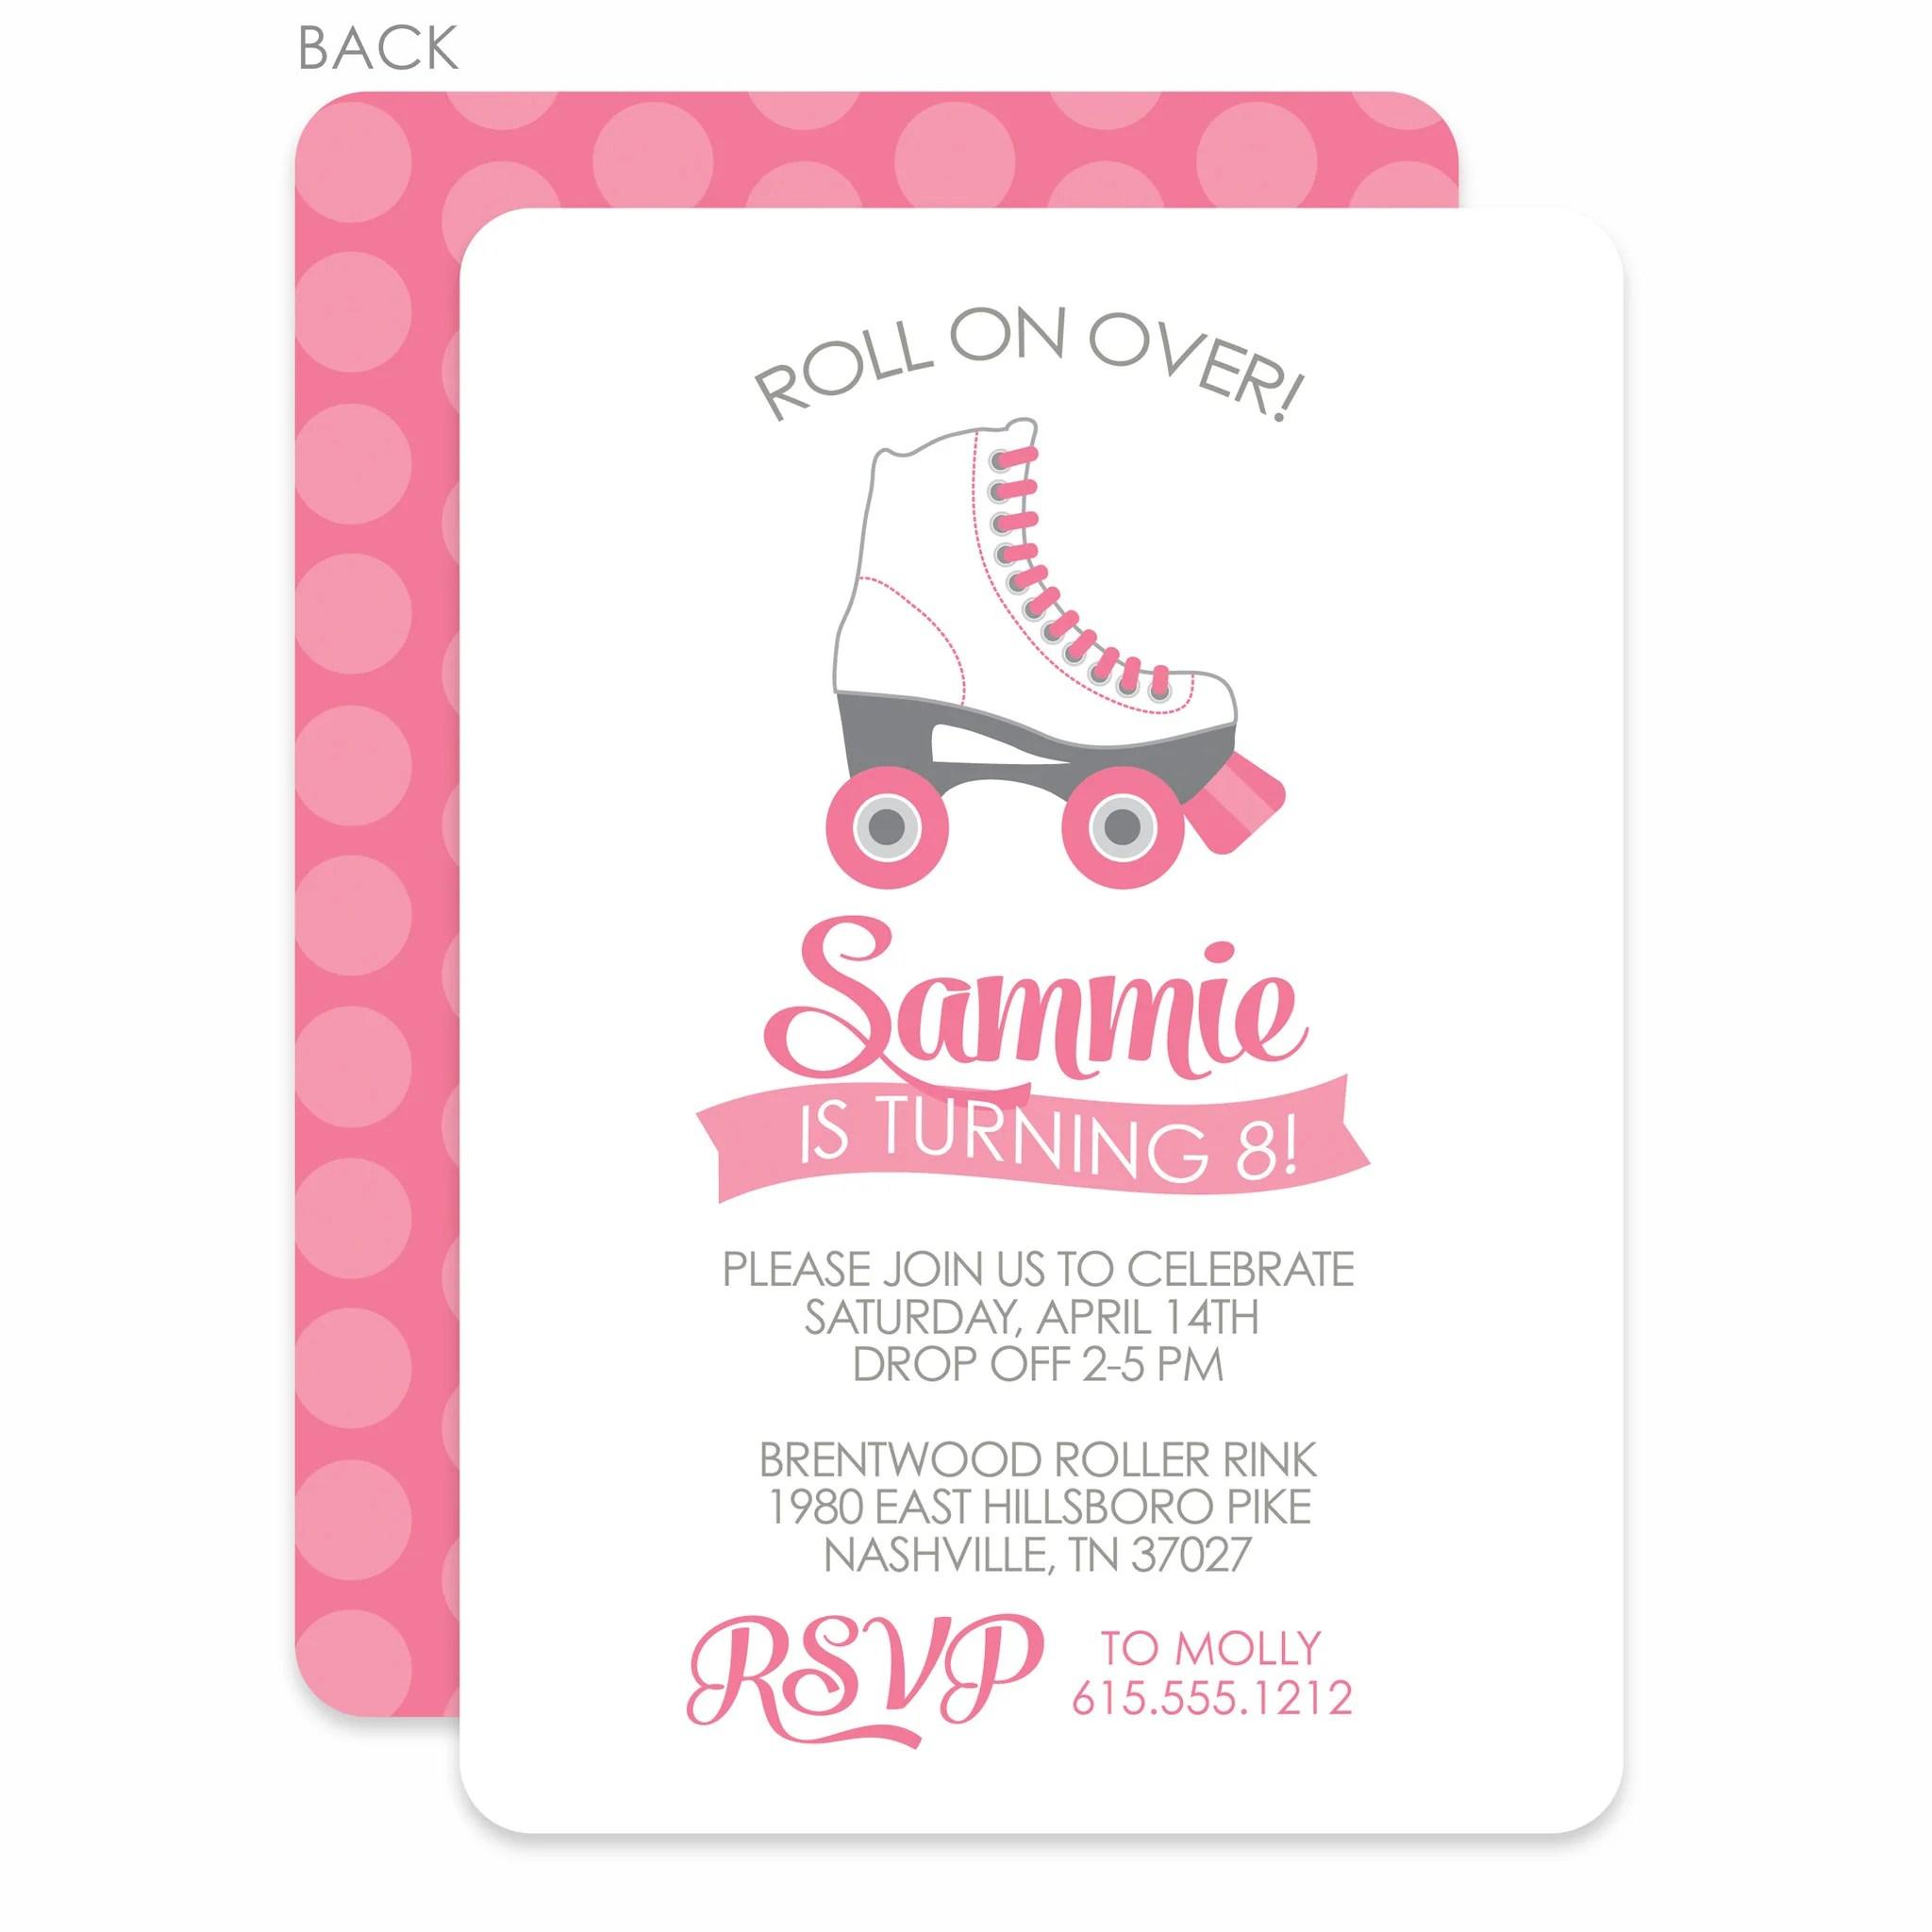 roller skating party birthday invitation pink printed